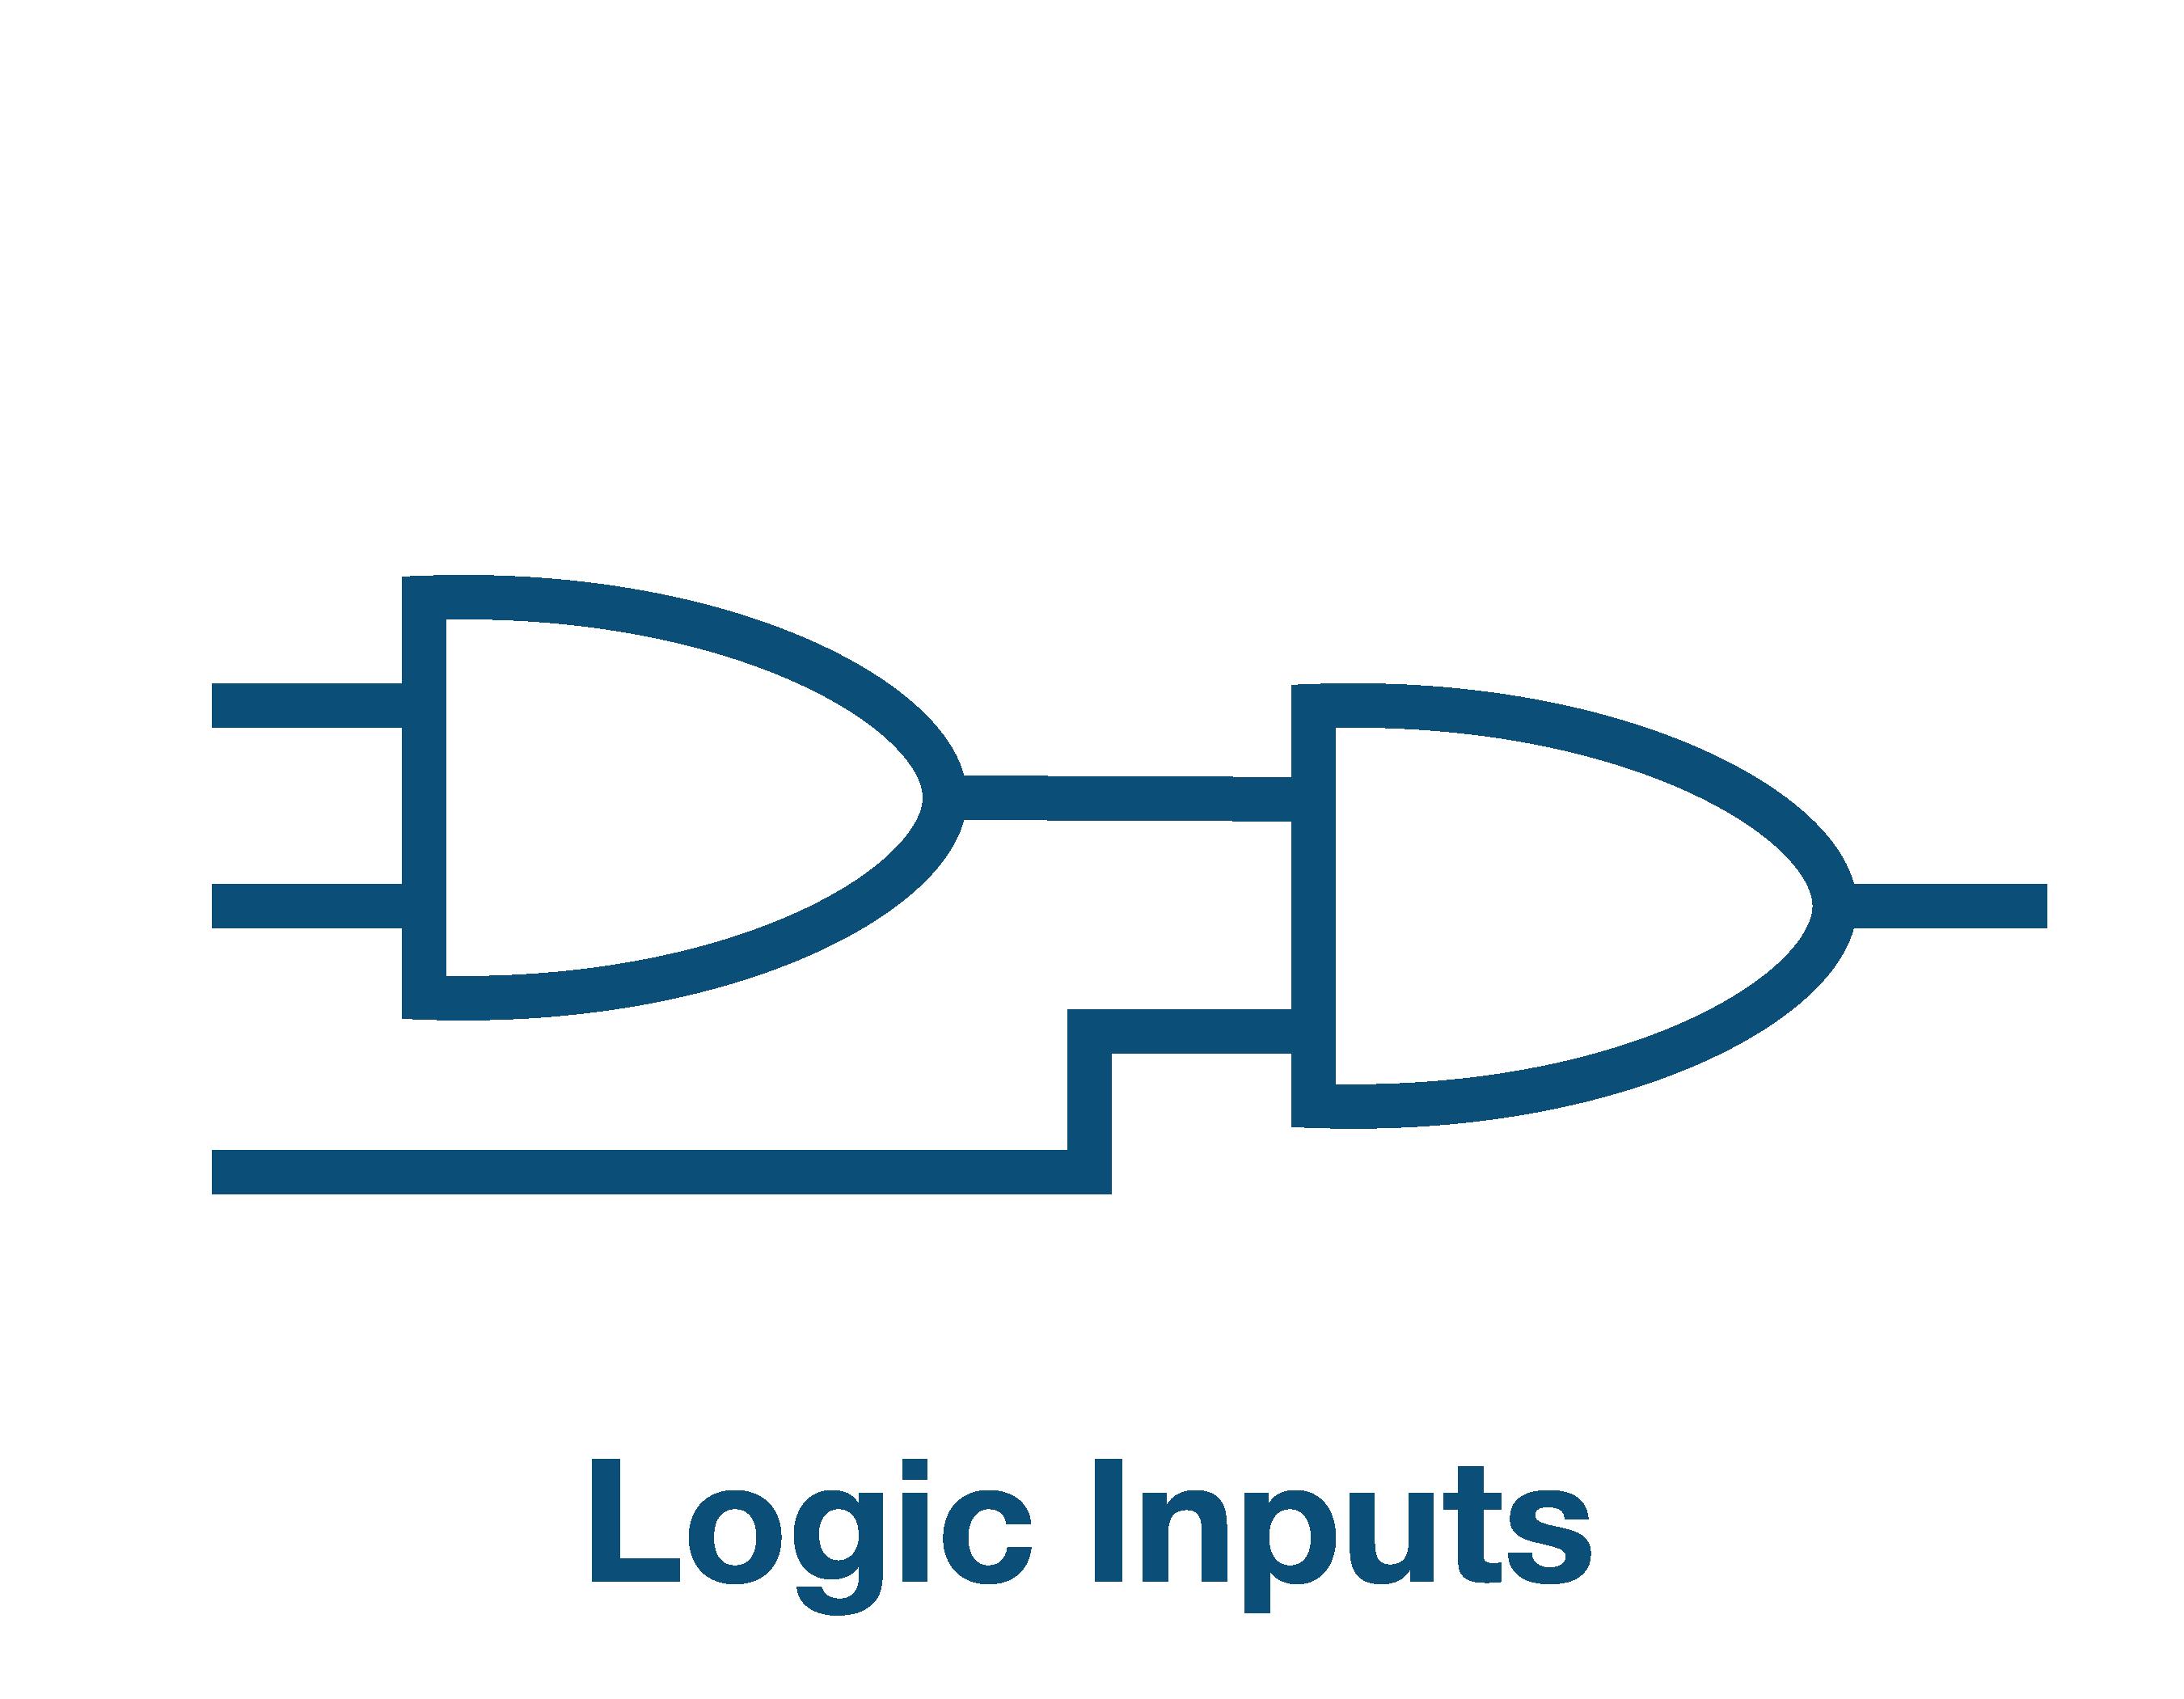 Logic Input x 2